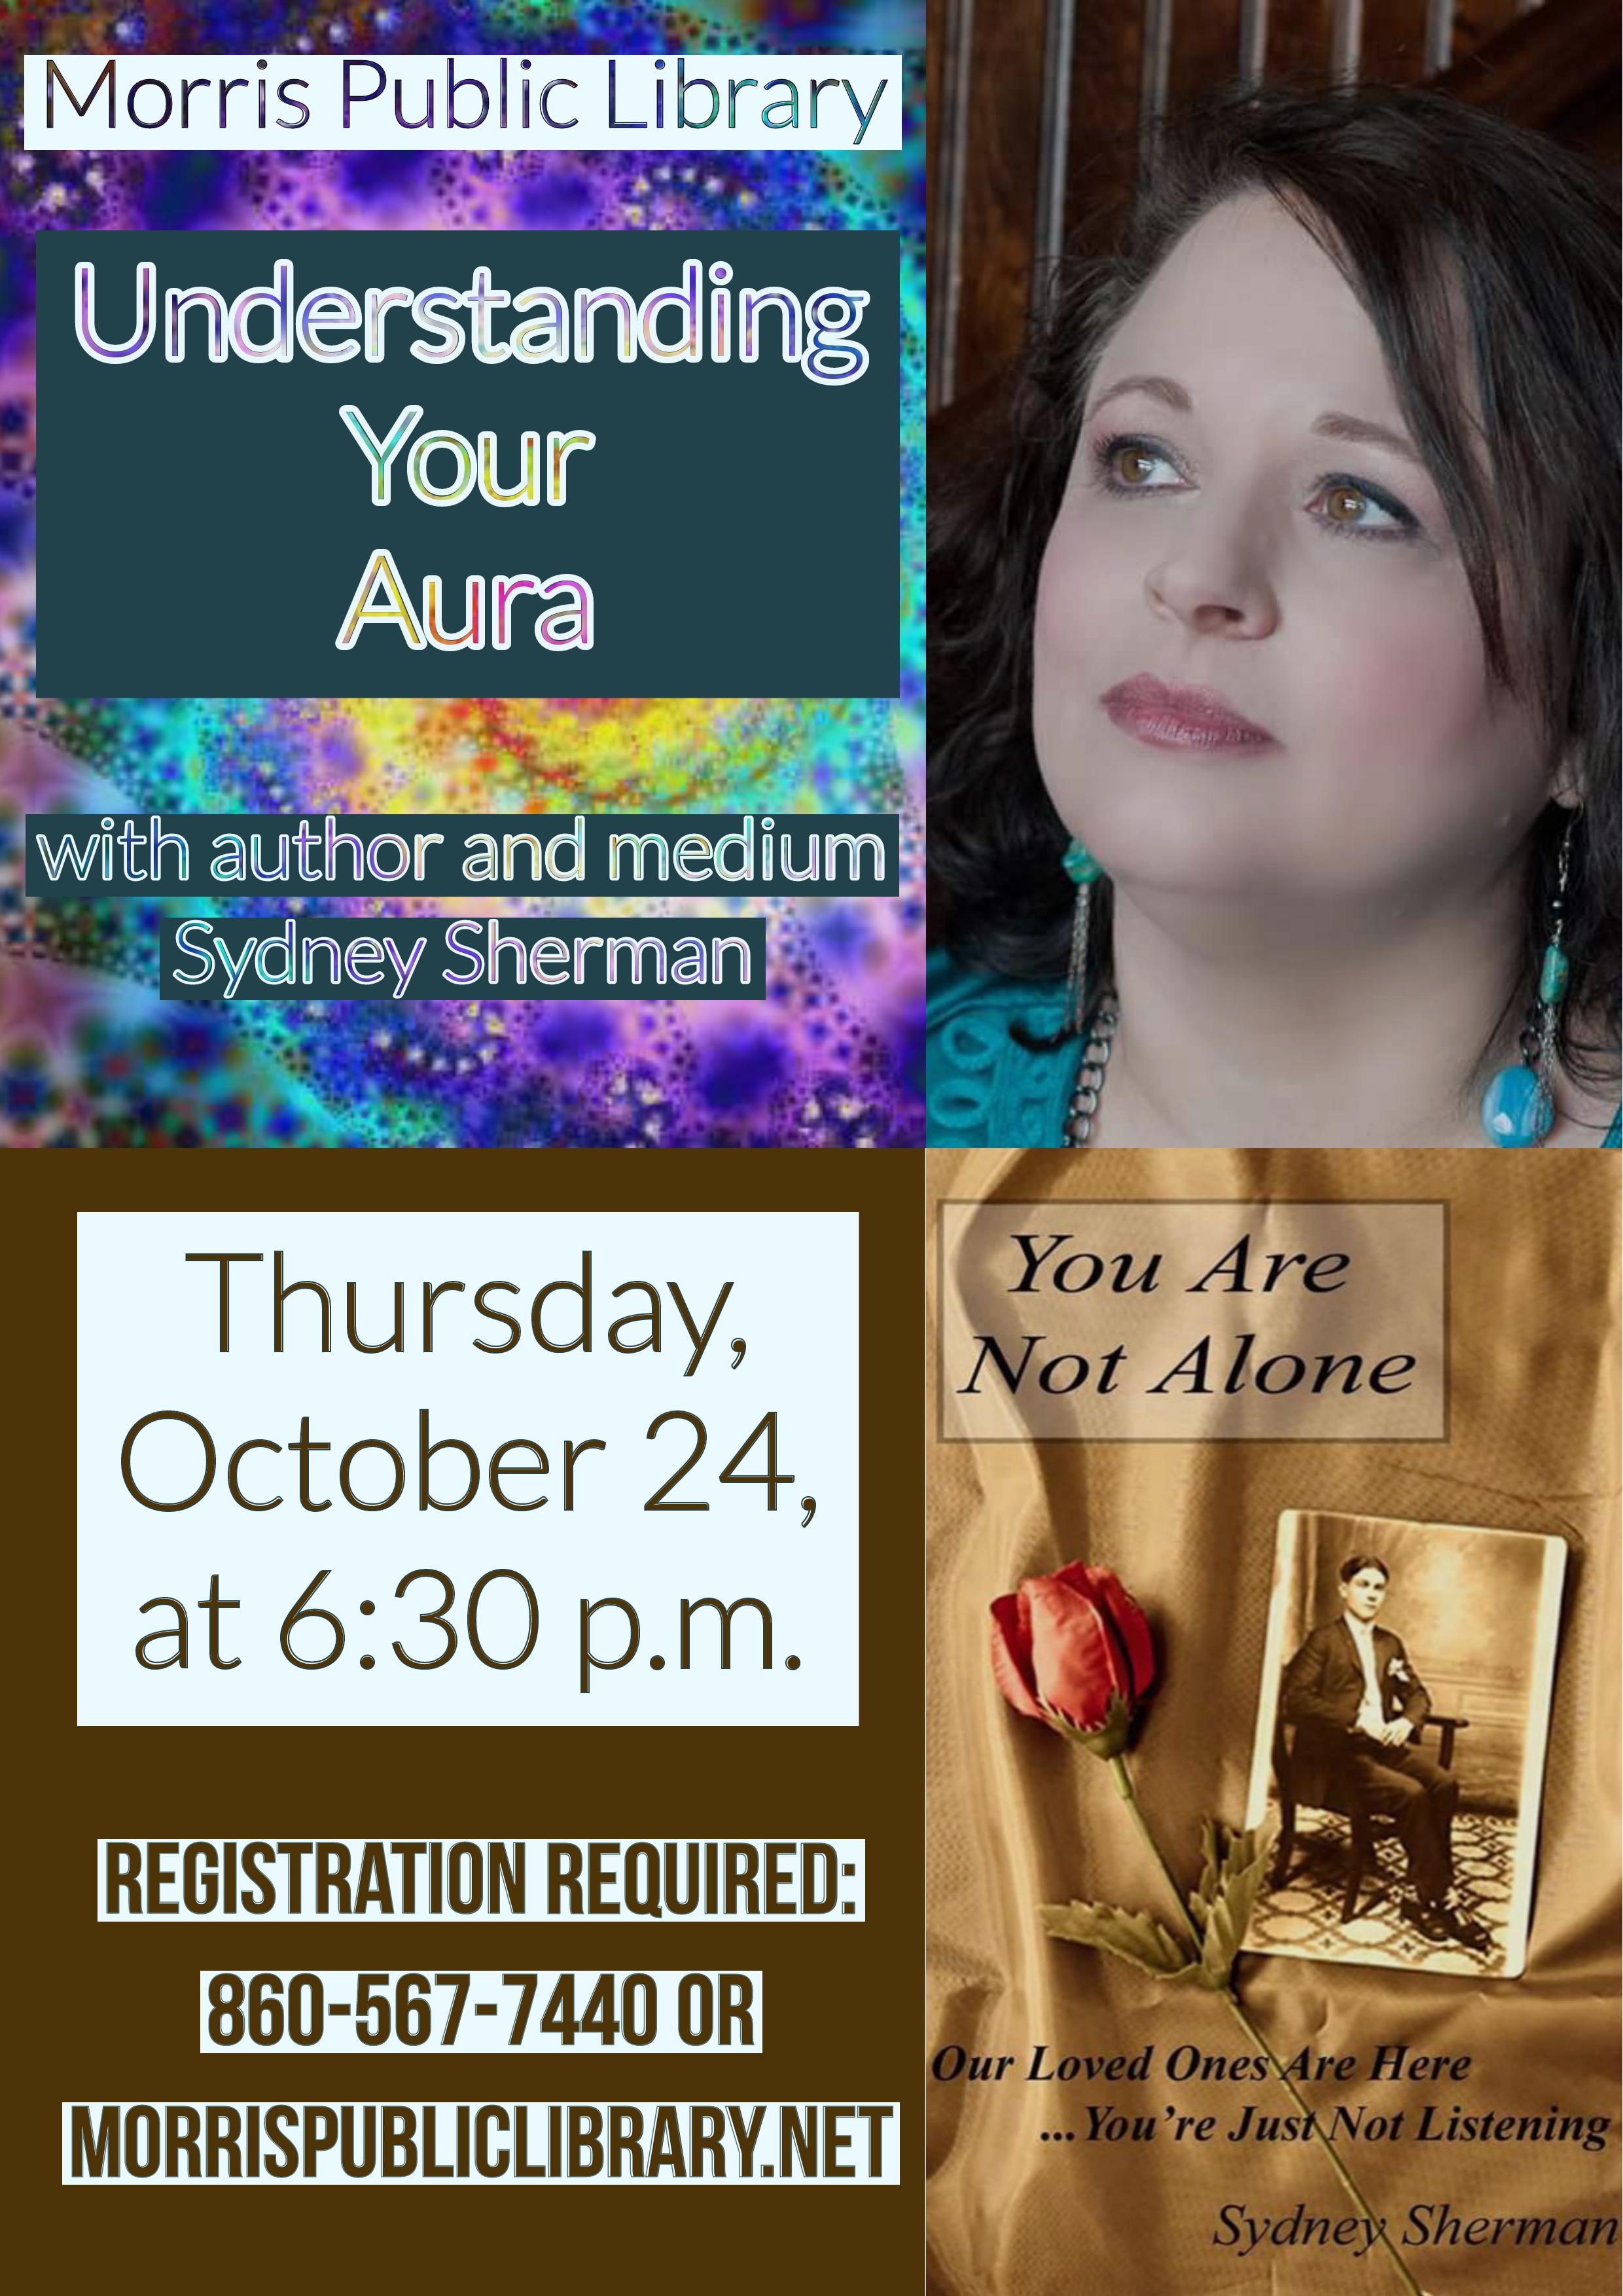 Morris Public Library, Understanding Your Aura.png